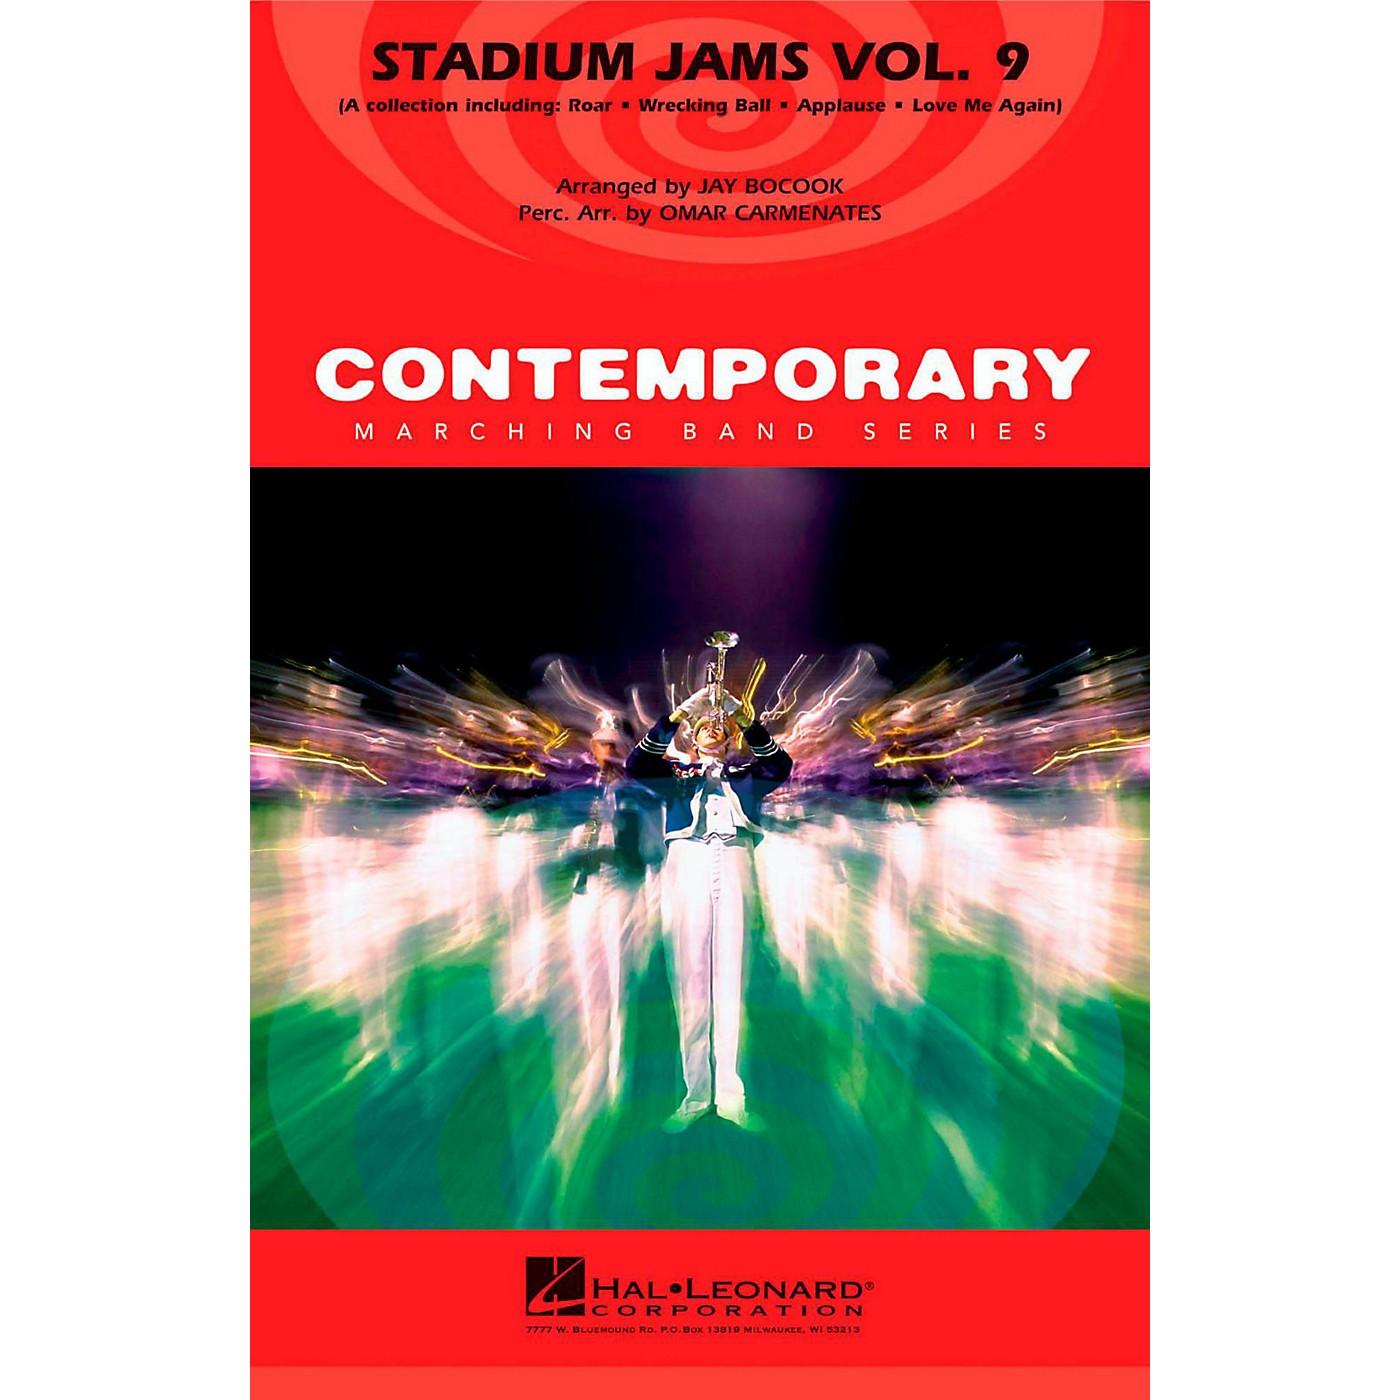 Hal Leonard Stadium Jams Vol. 9 - Pep Band/Marching Band Level 3 thumbnail